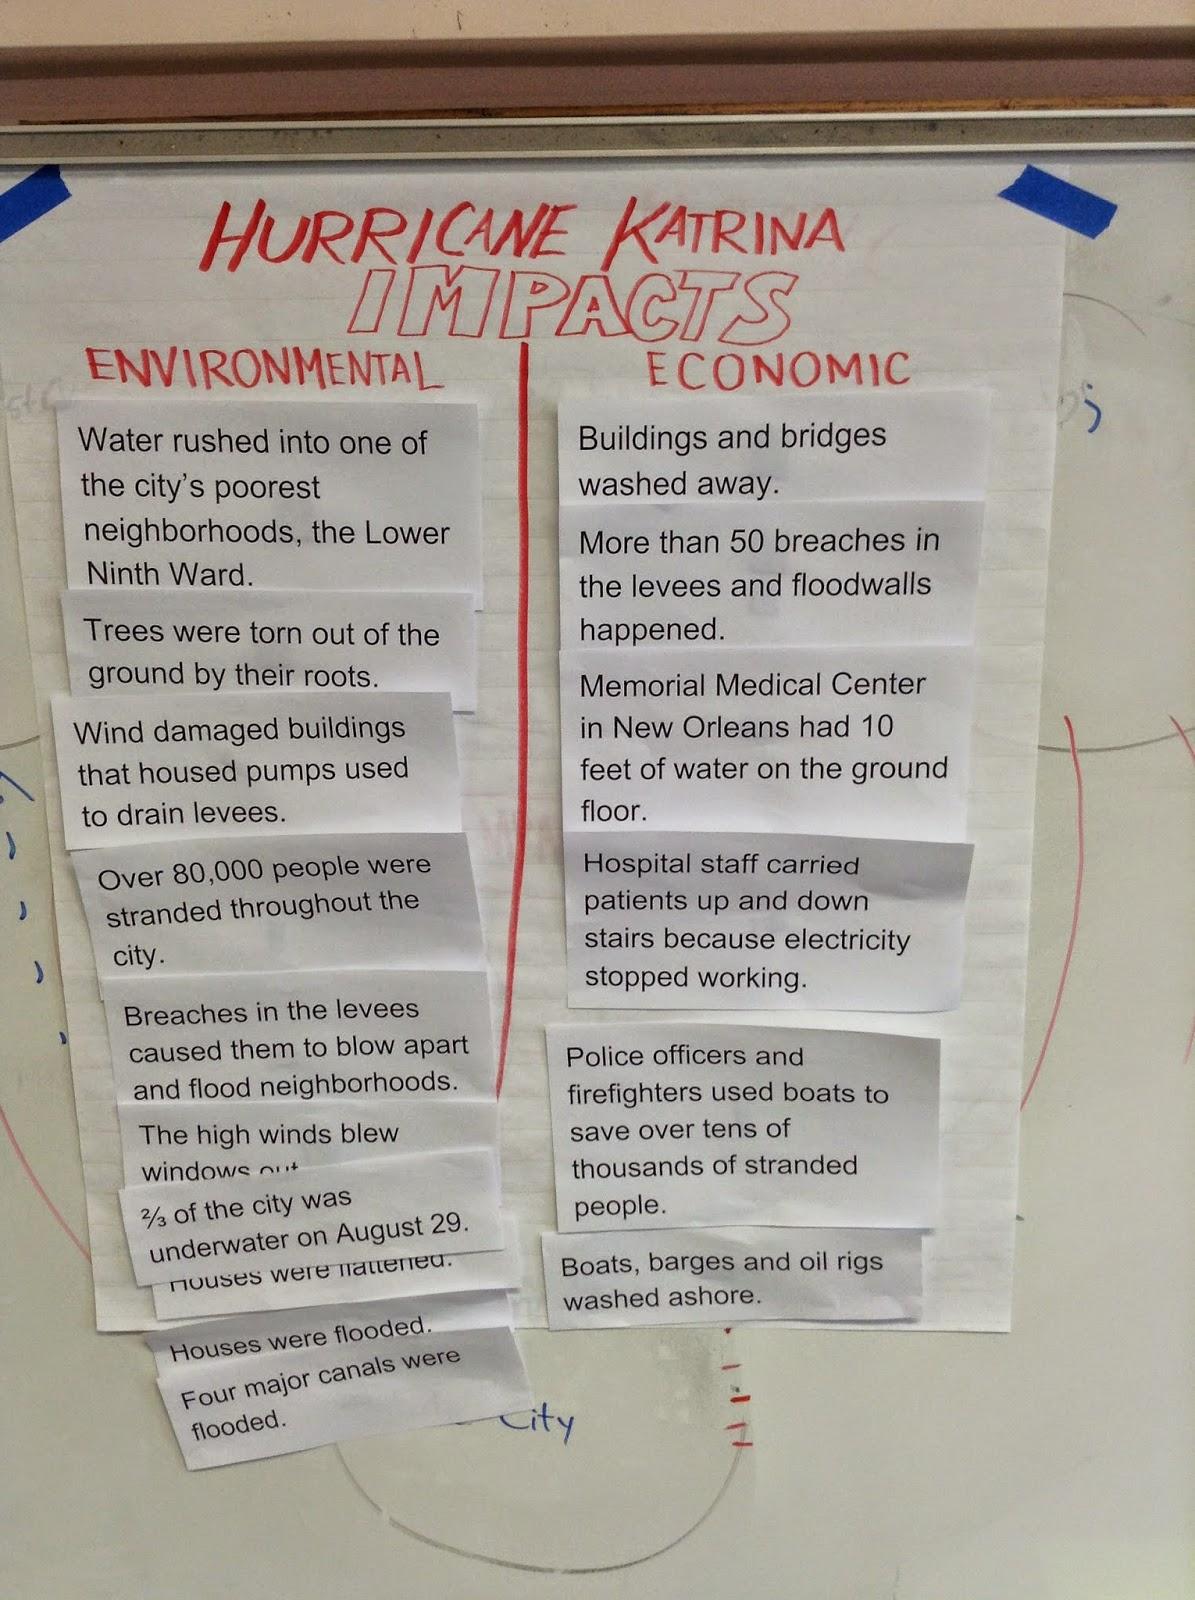 Room 212 Mr Shaddox S Social Stu S Blog Class 6 Hurricane Katrina Case Study